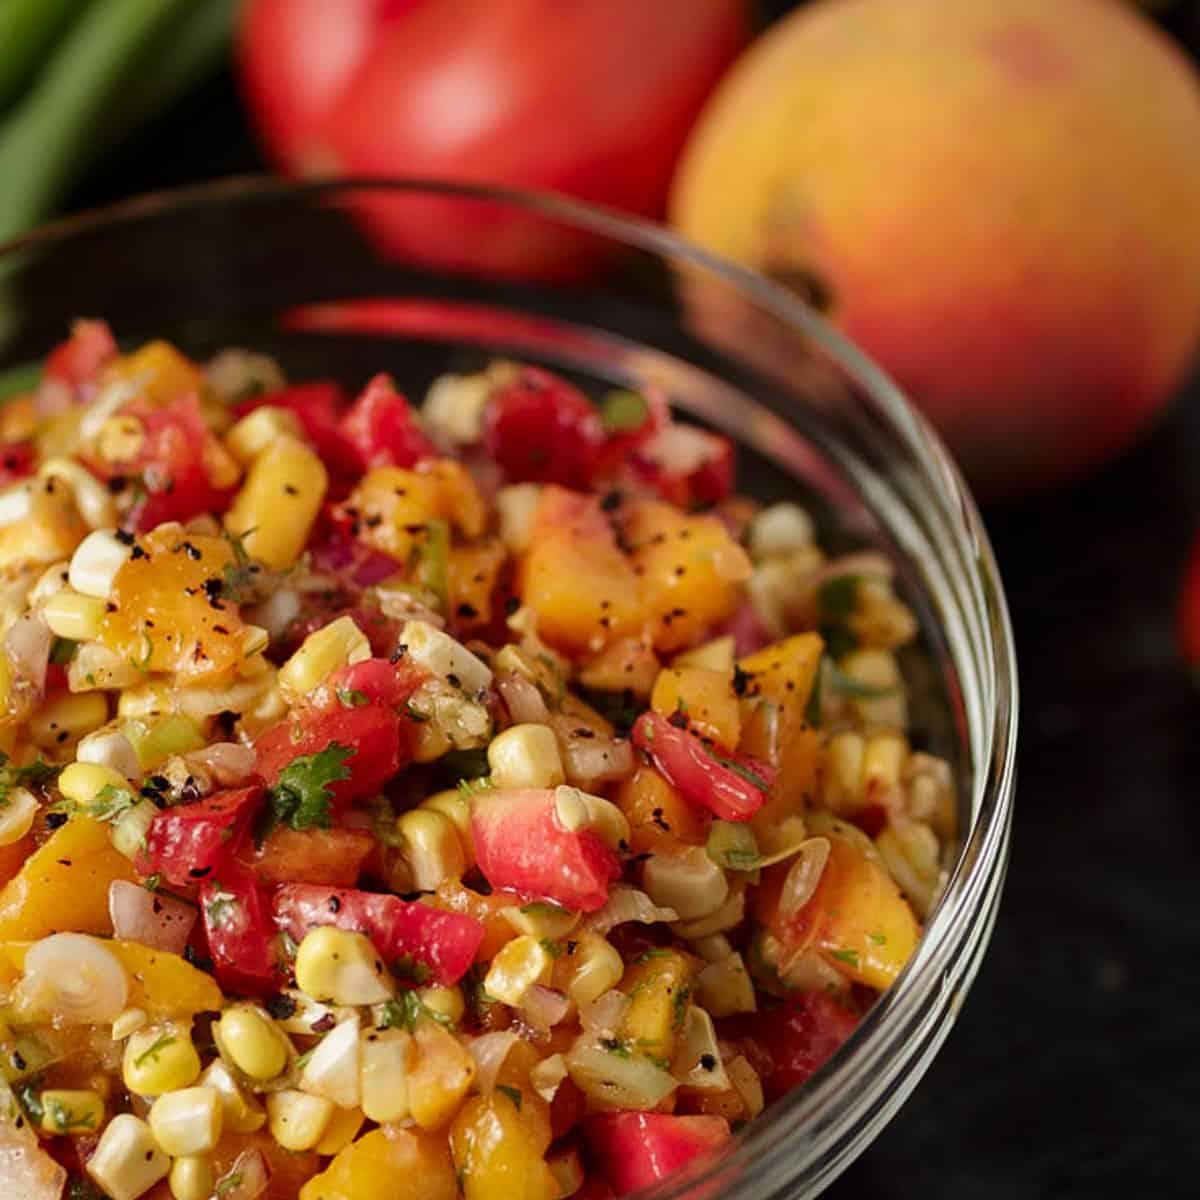 A glass bowl of peach and corn salsa